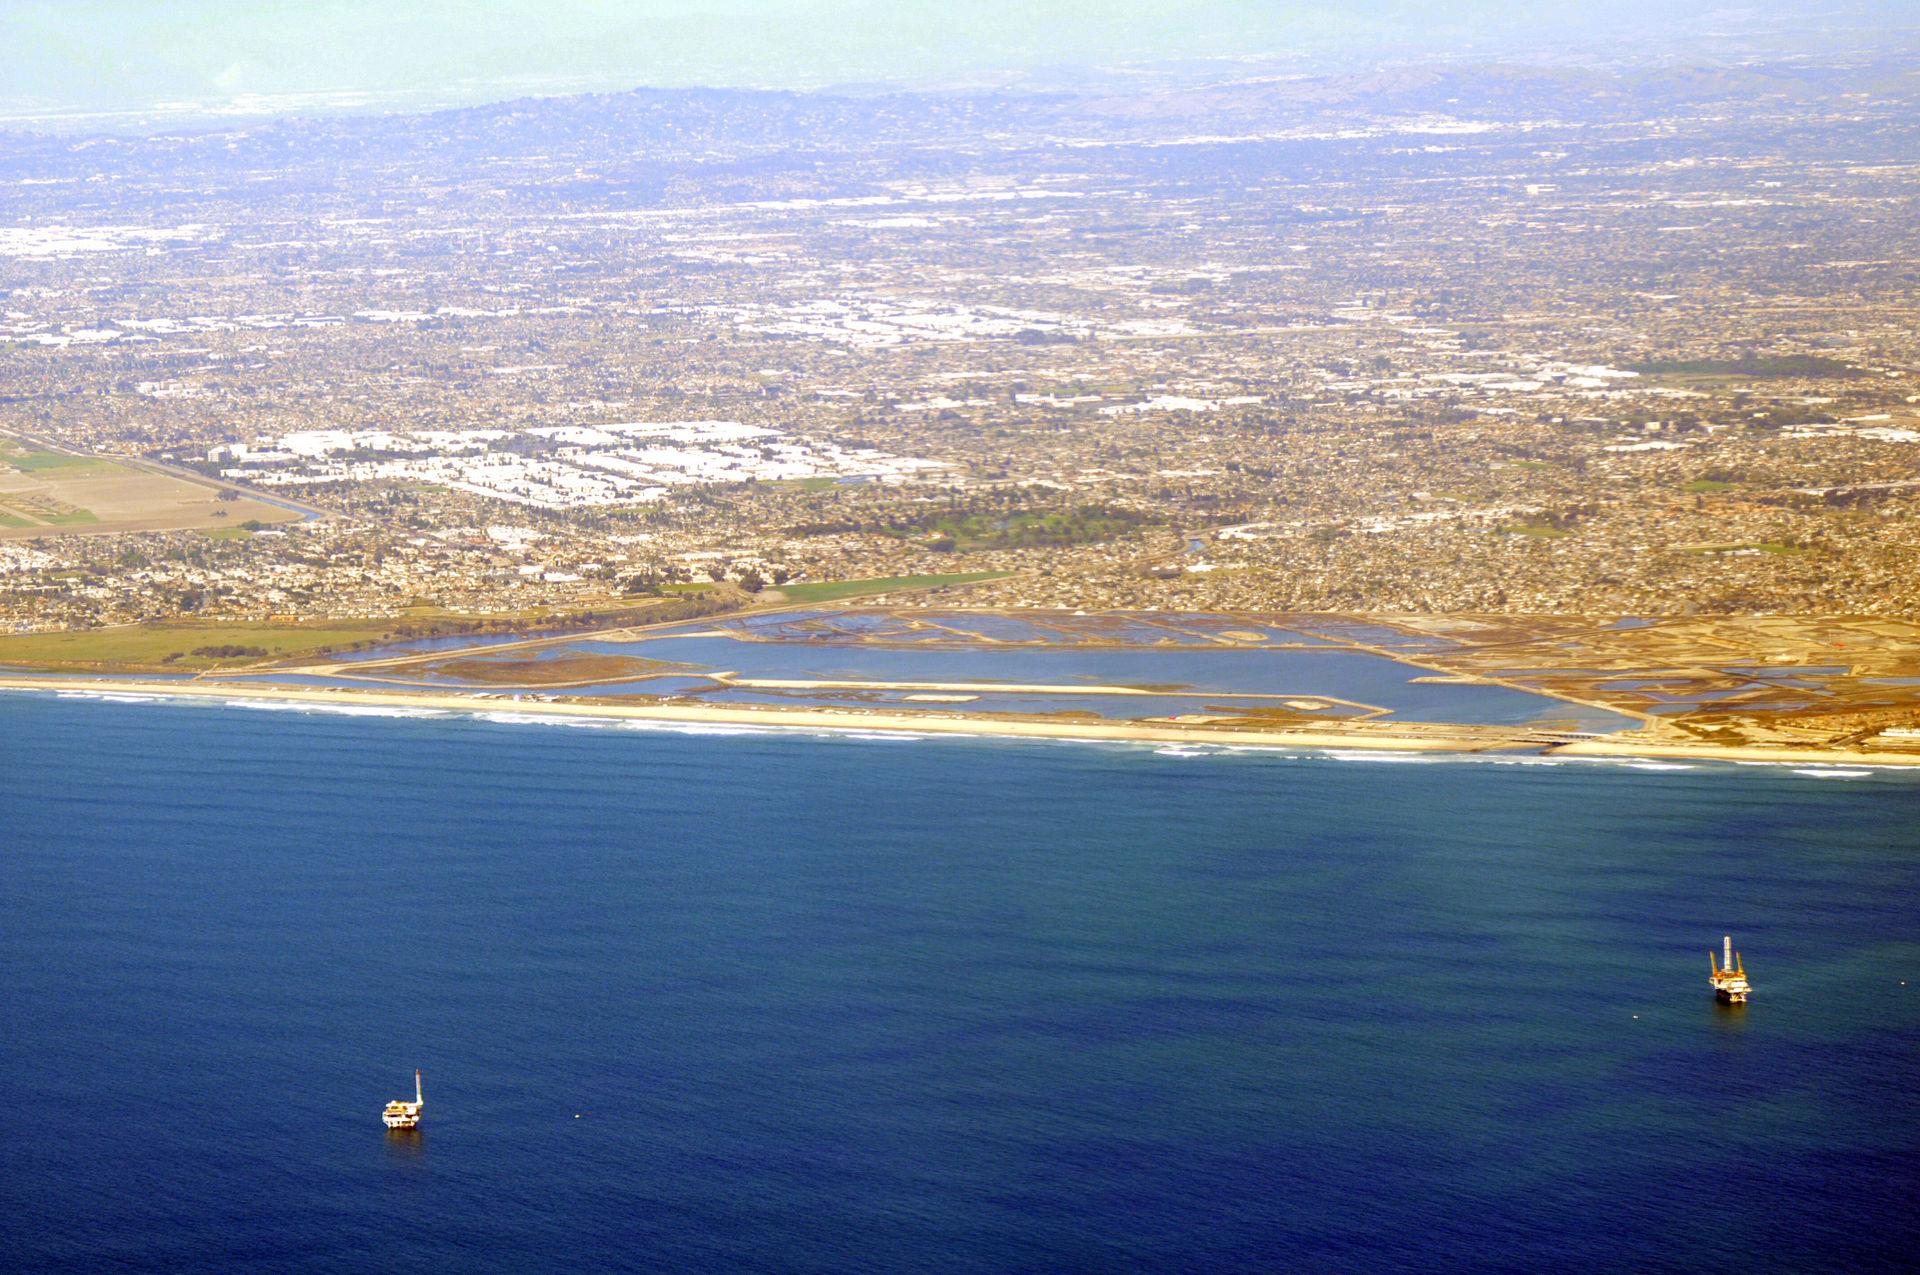 City Of Huntington Beach Chimney Plan